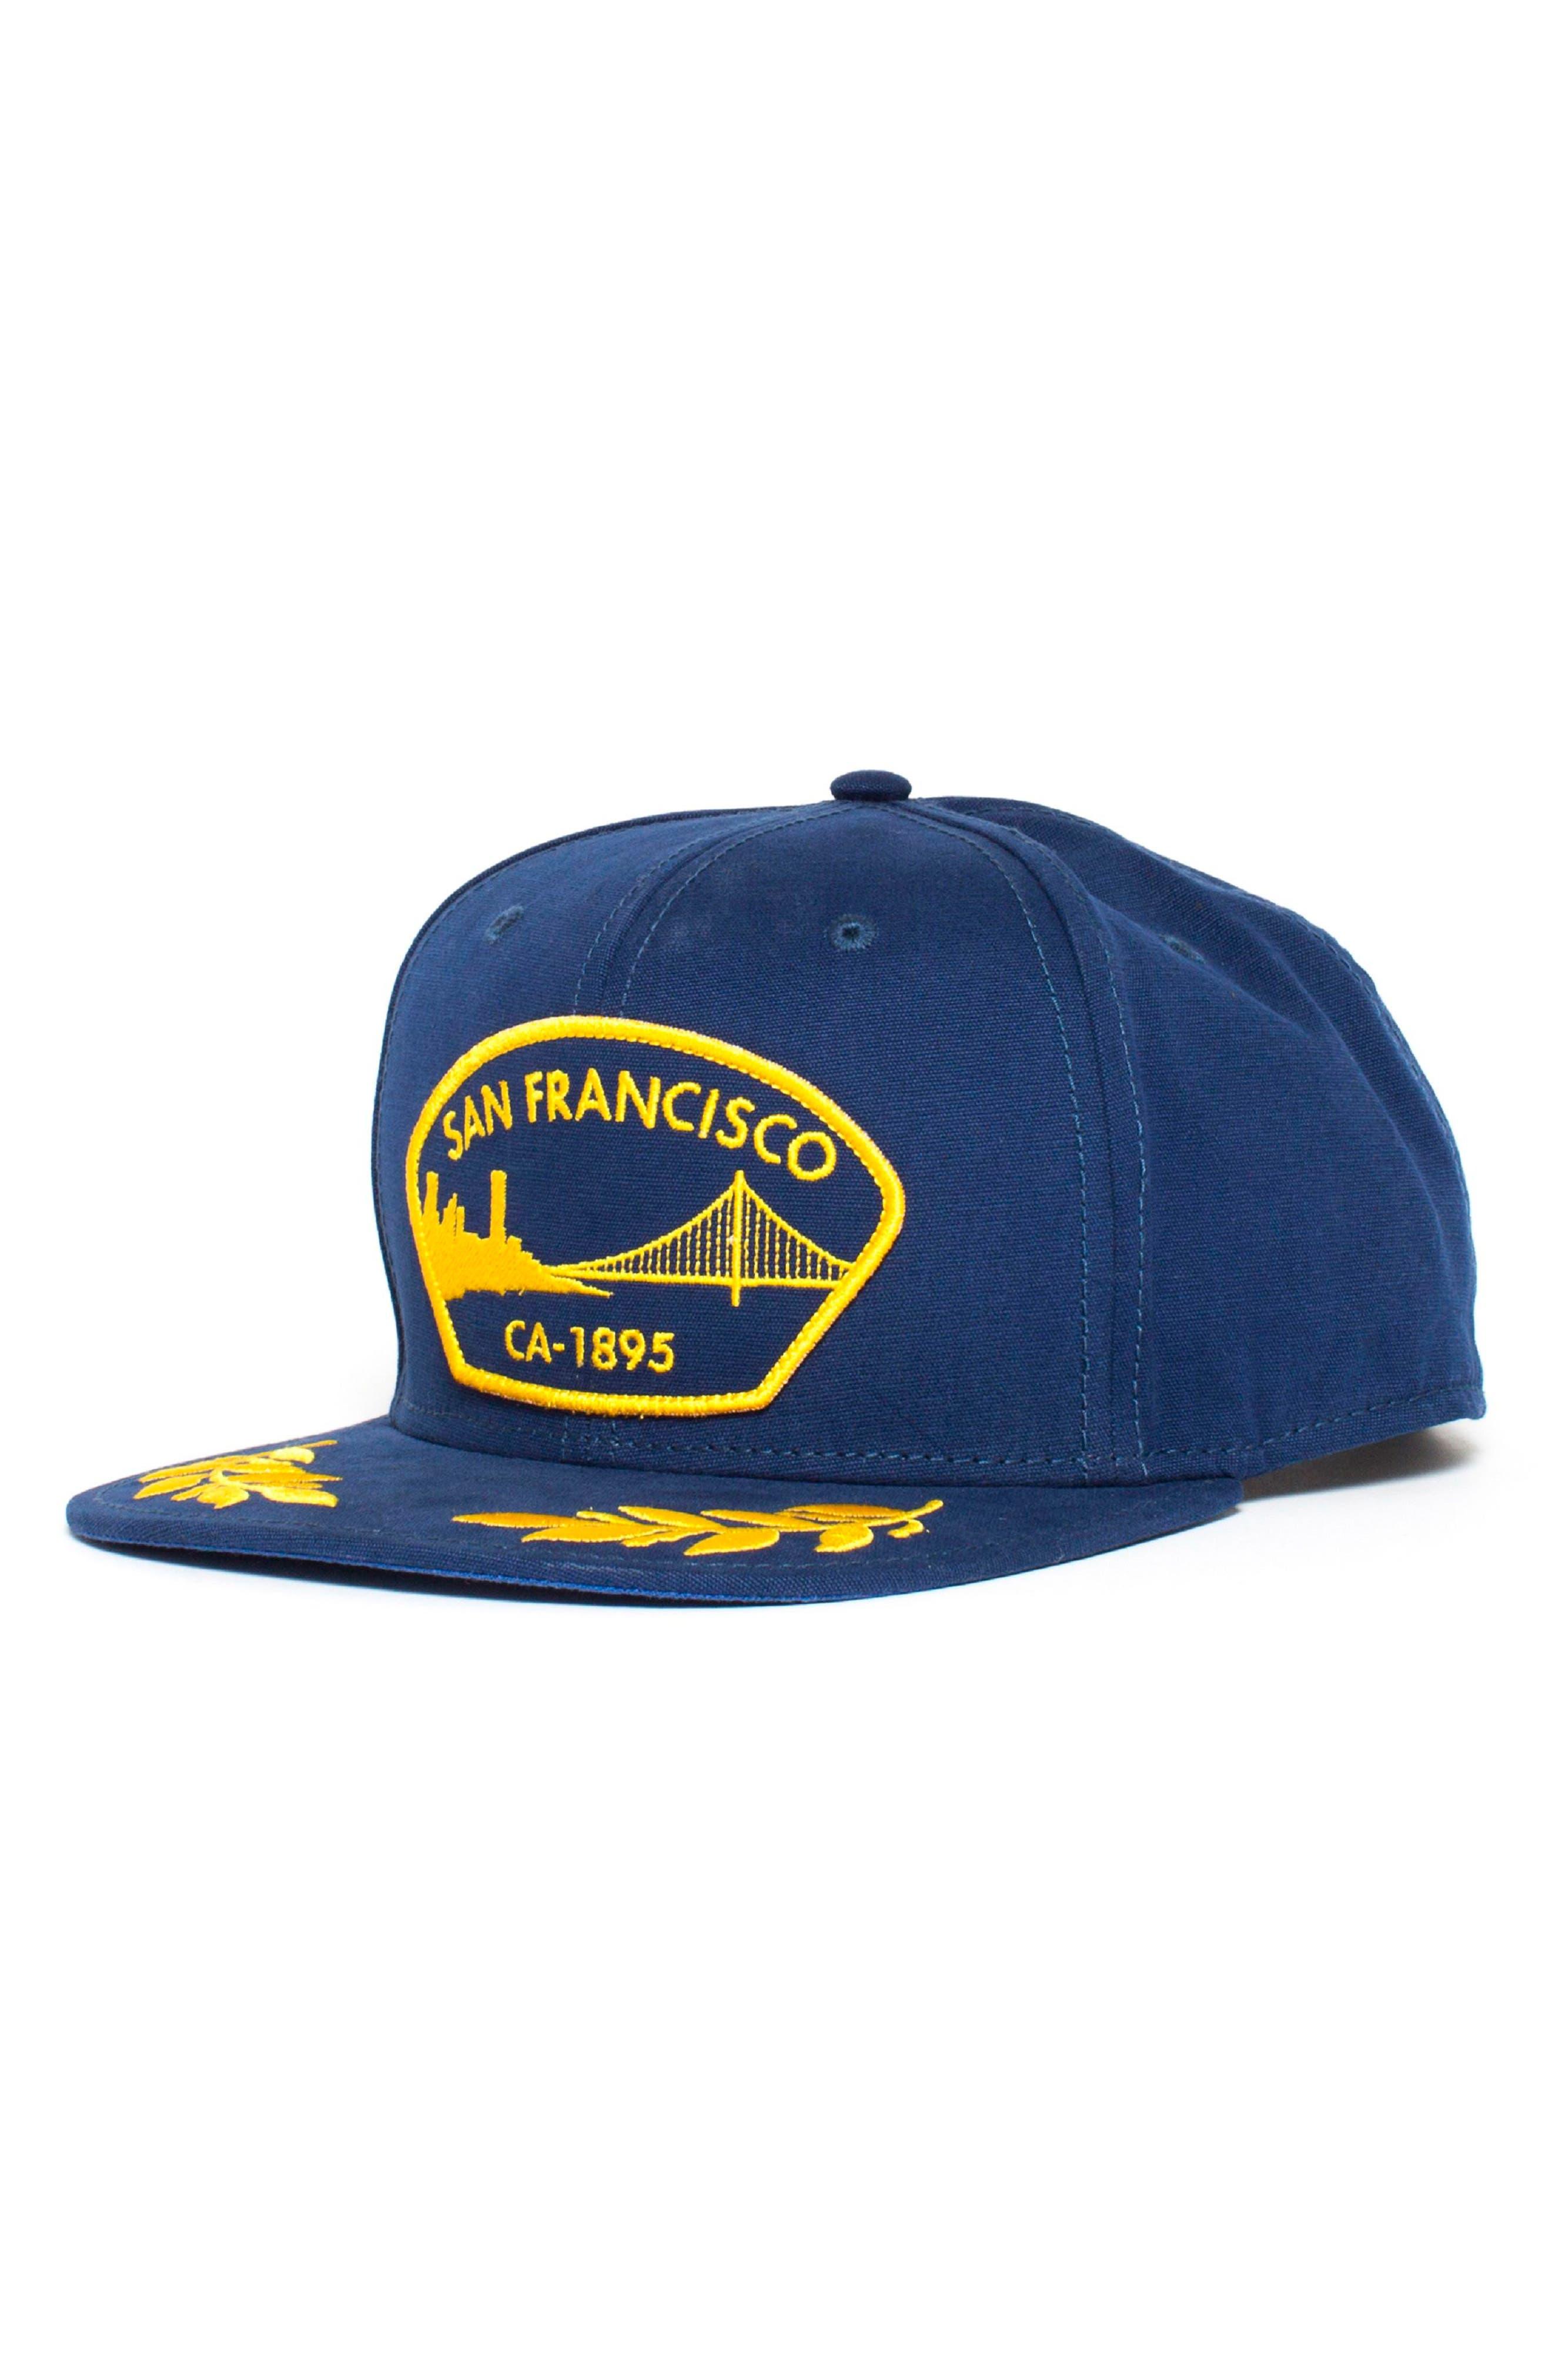 Goorin Brothers 'San Francisco' Baseball Cap